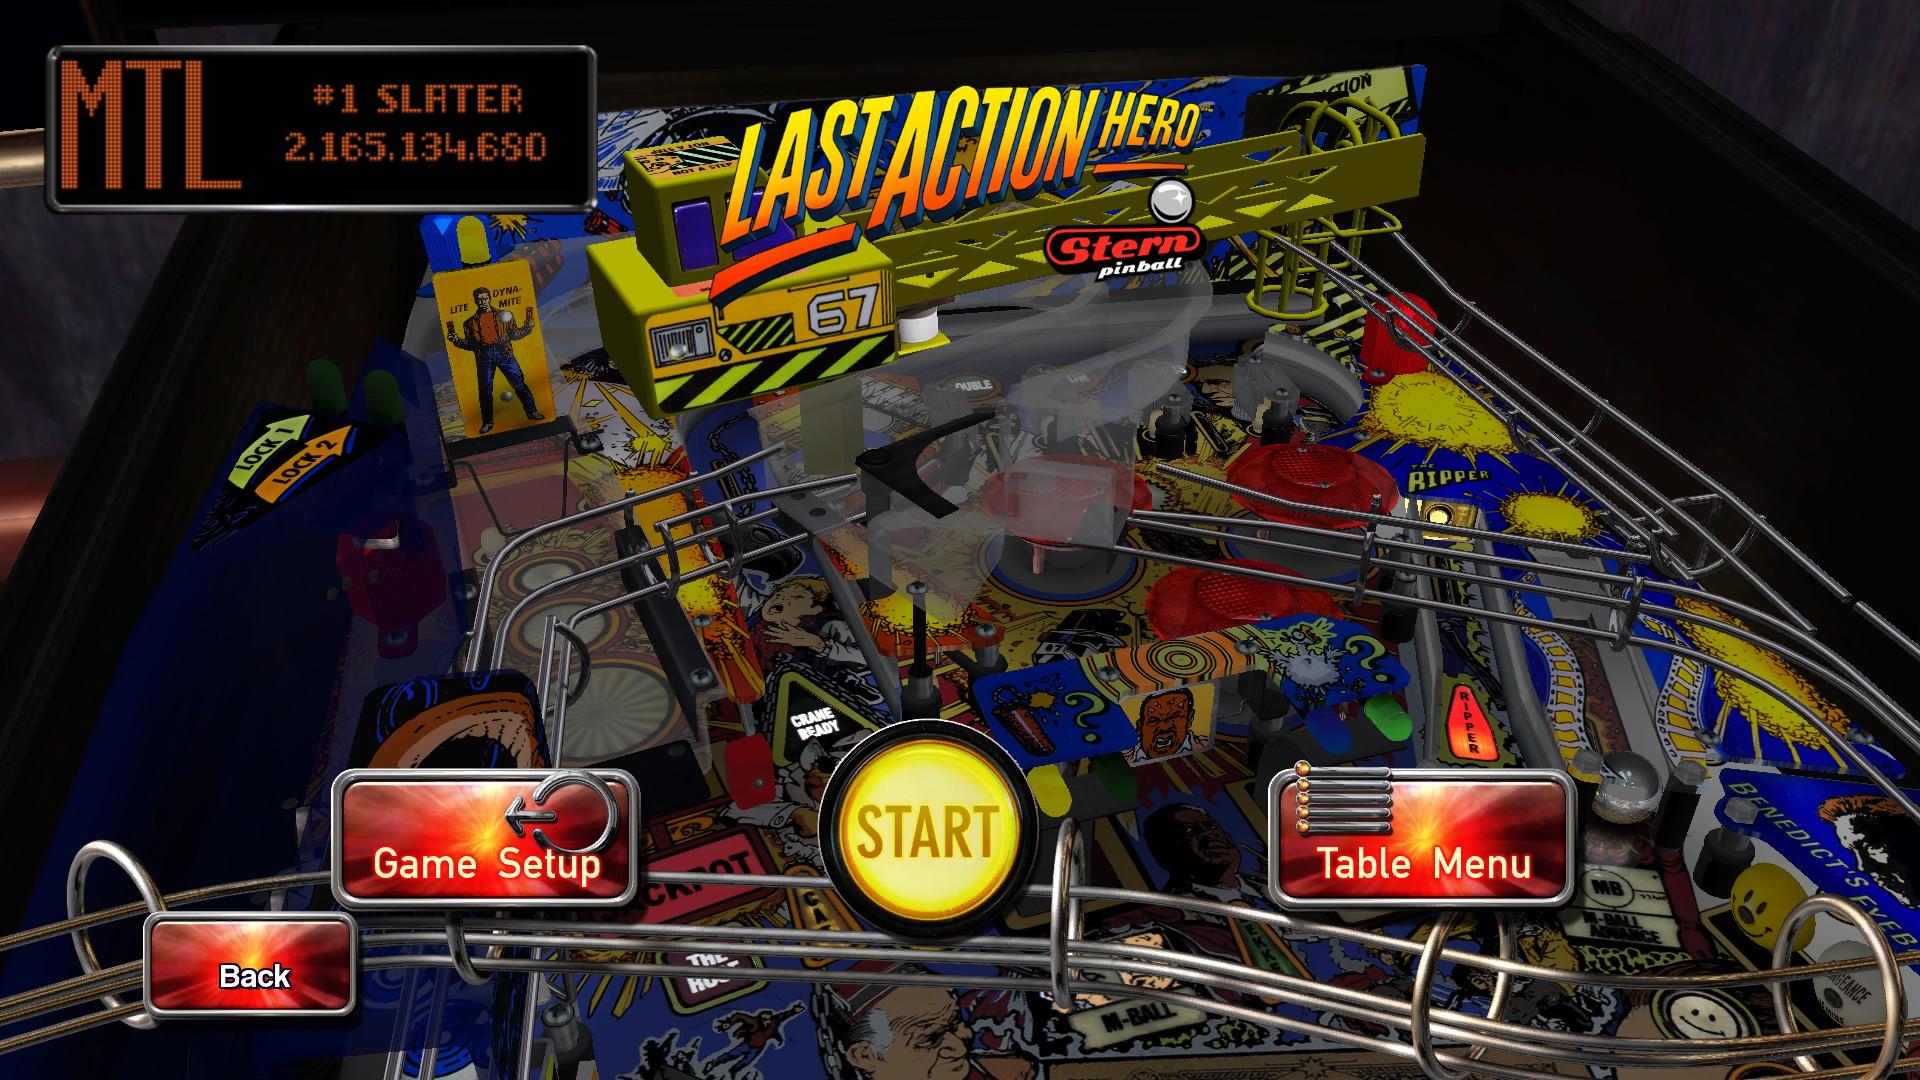 Mantalow: Pinball Arcade: Last Action Hero (PC) 2,165,134,680 points on 2016-04-29 03:31:12